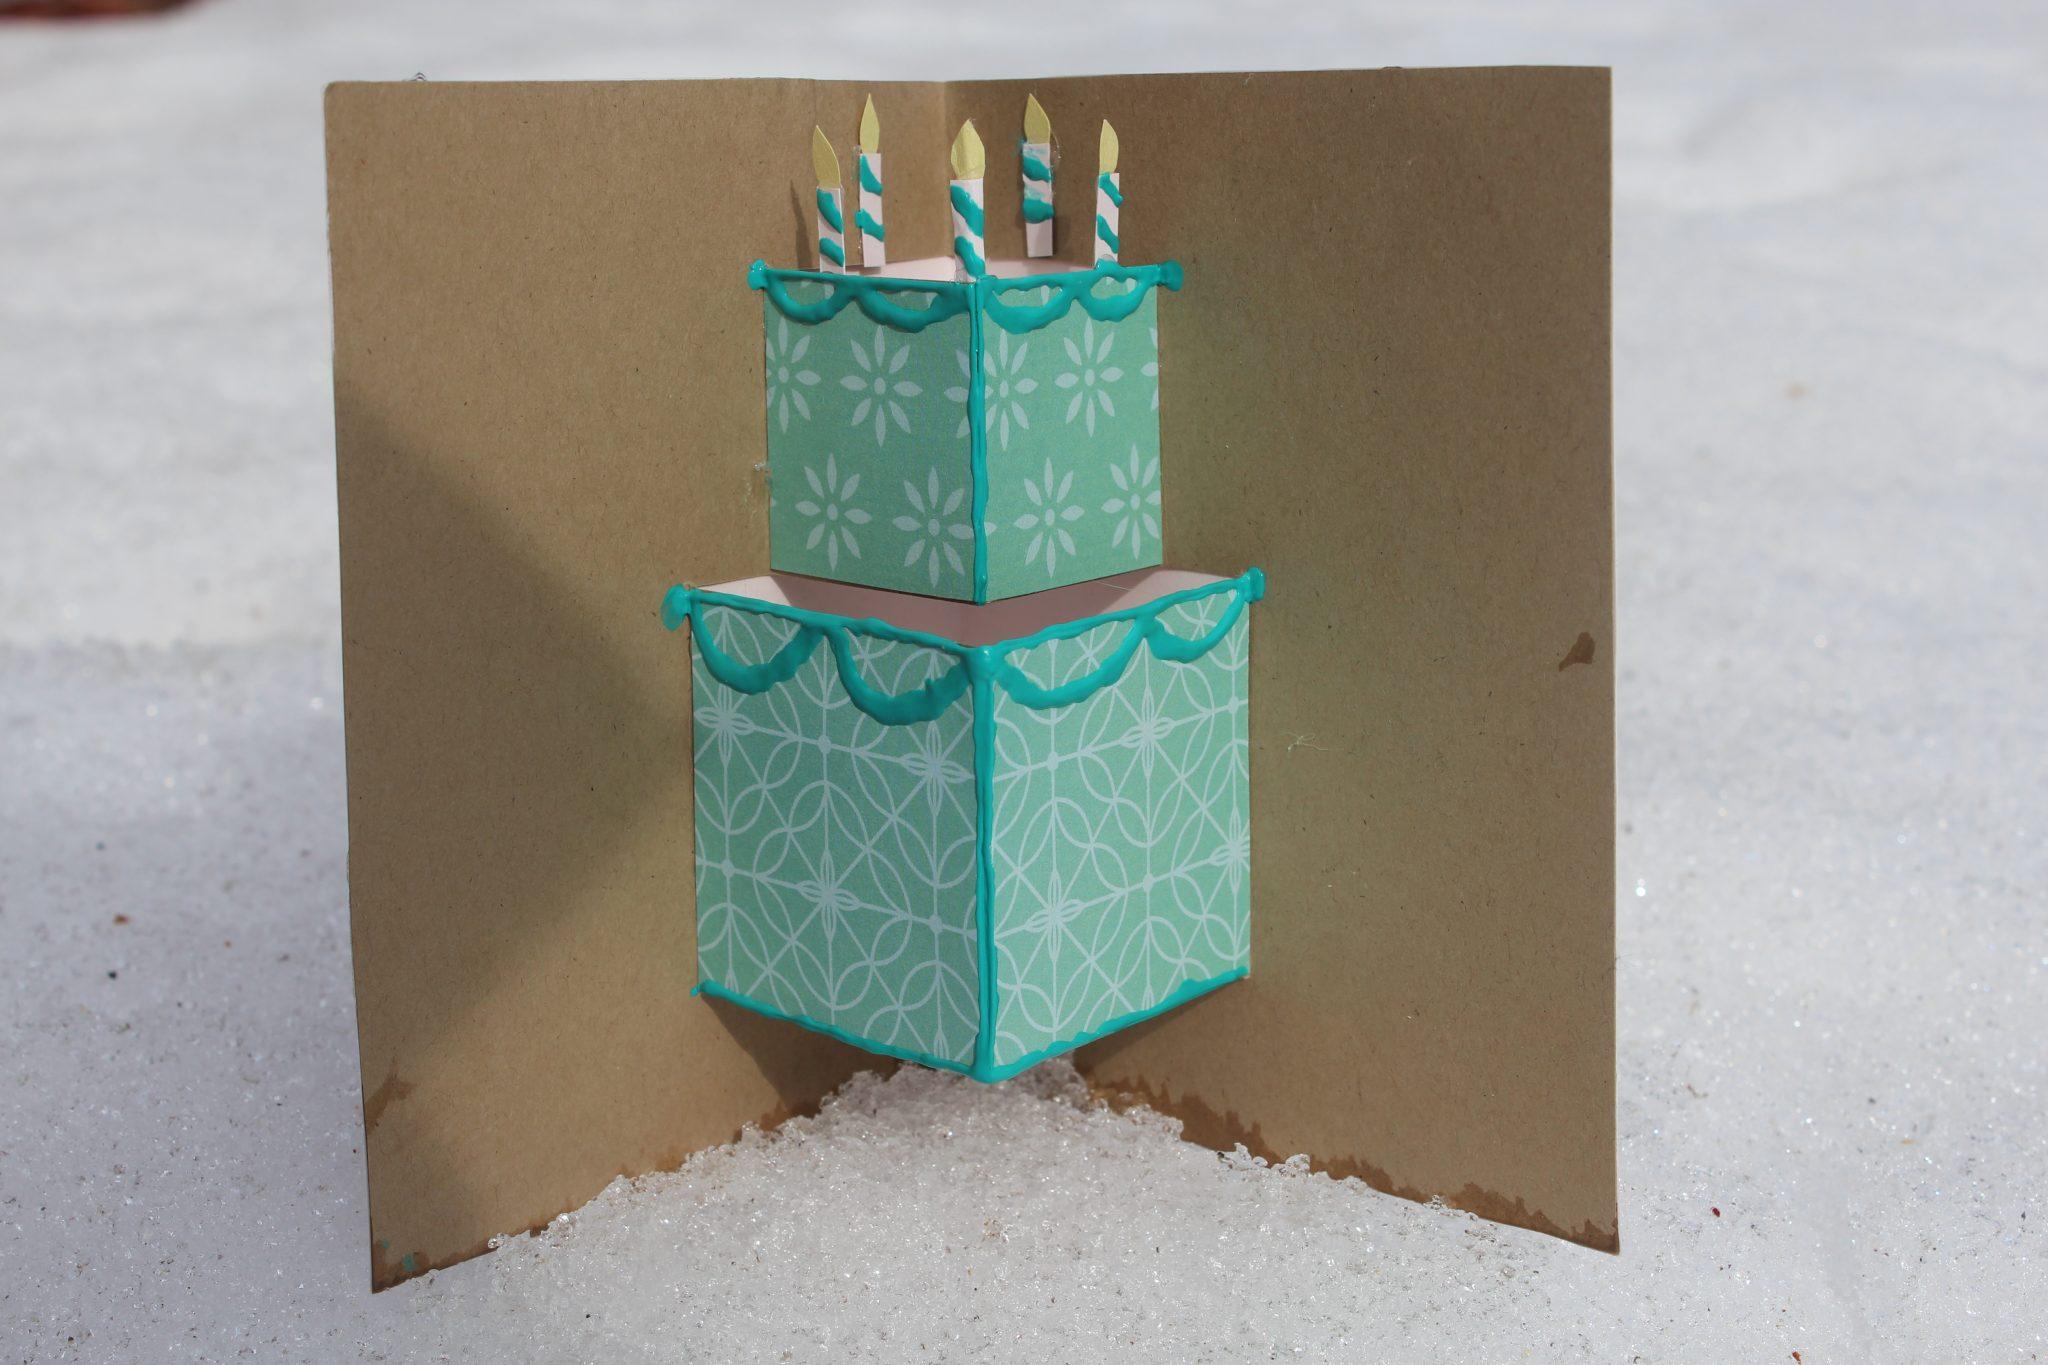 Free Simple Birthday Cards ~ Pop up birthday cards simple how to make a simple popup birthday